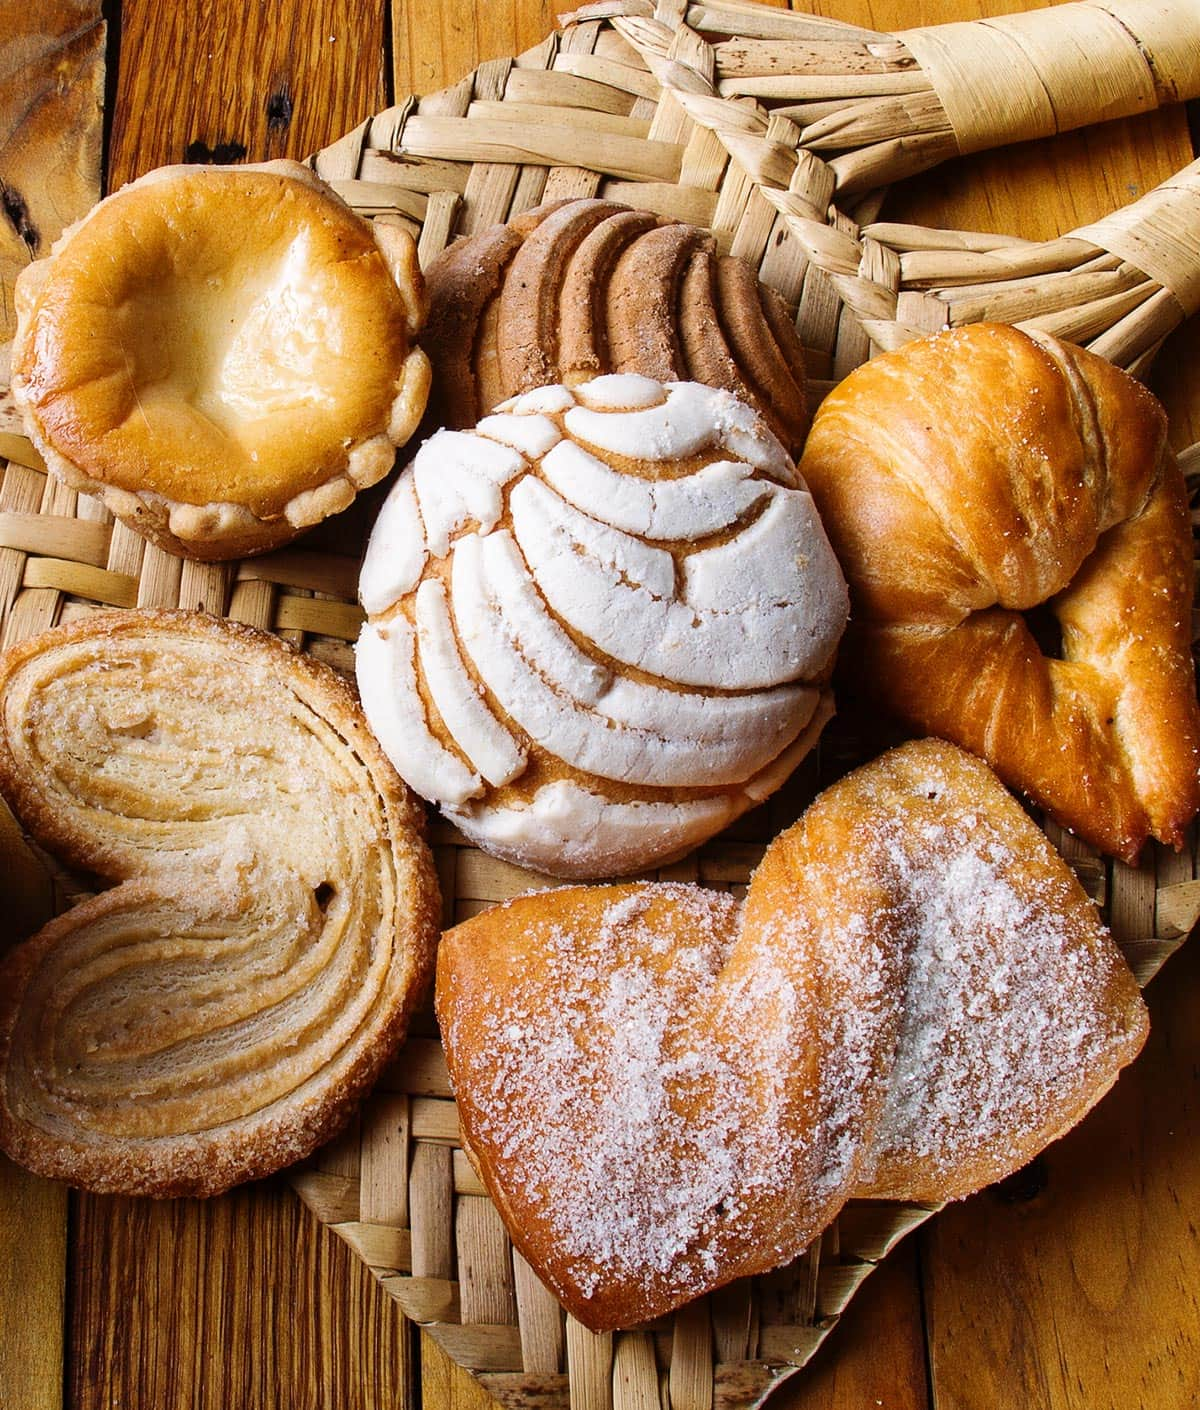 Pan dulce - Mexican sweet bread.